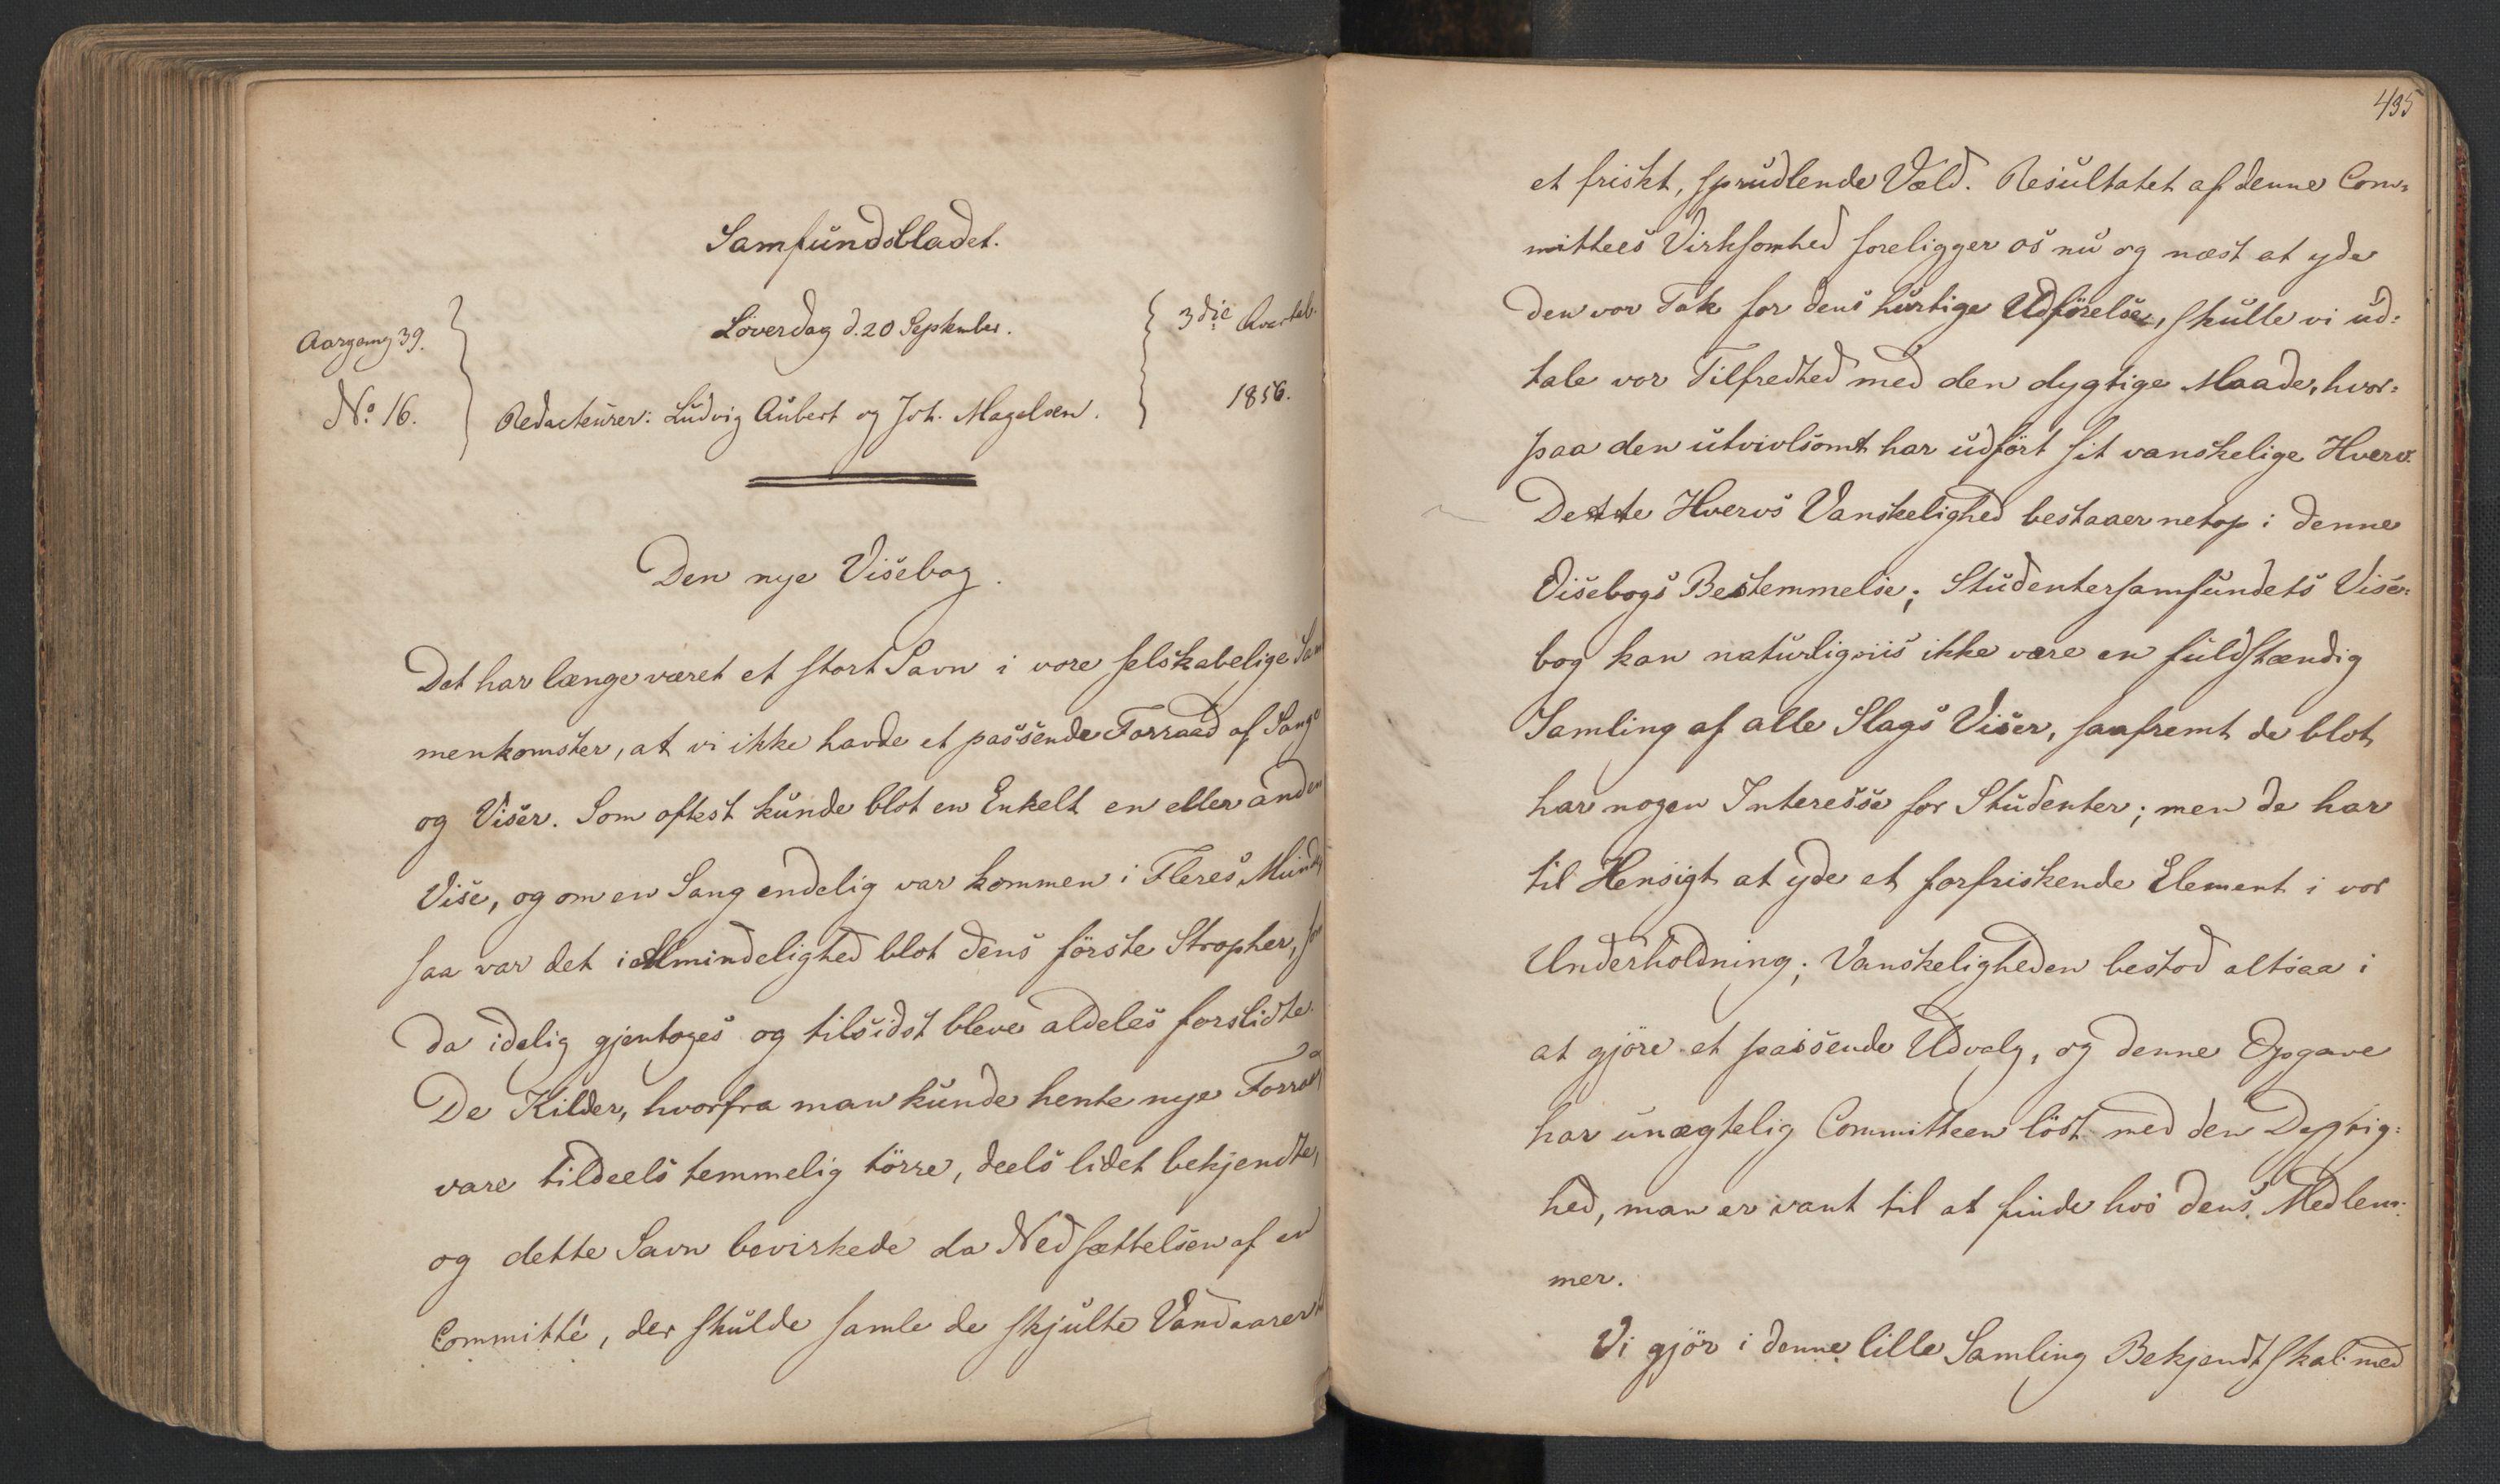 RA, Det Norske Studentersamfund, X/Xa/L0005, 1855-1856, s. 220